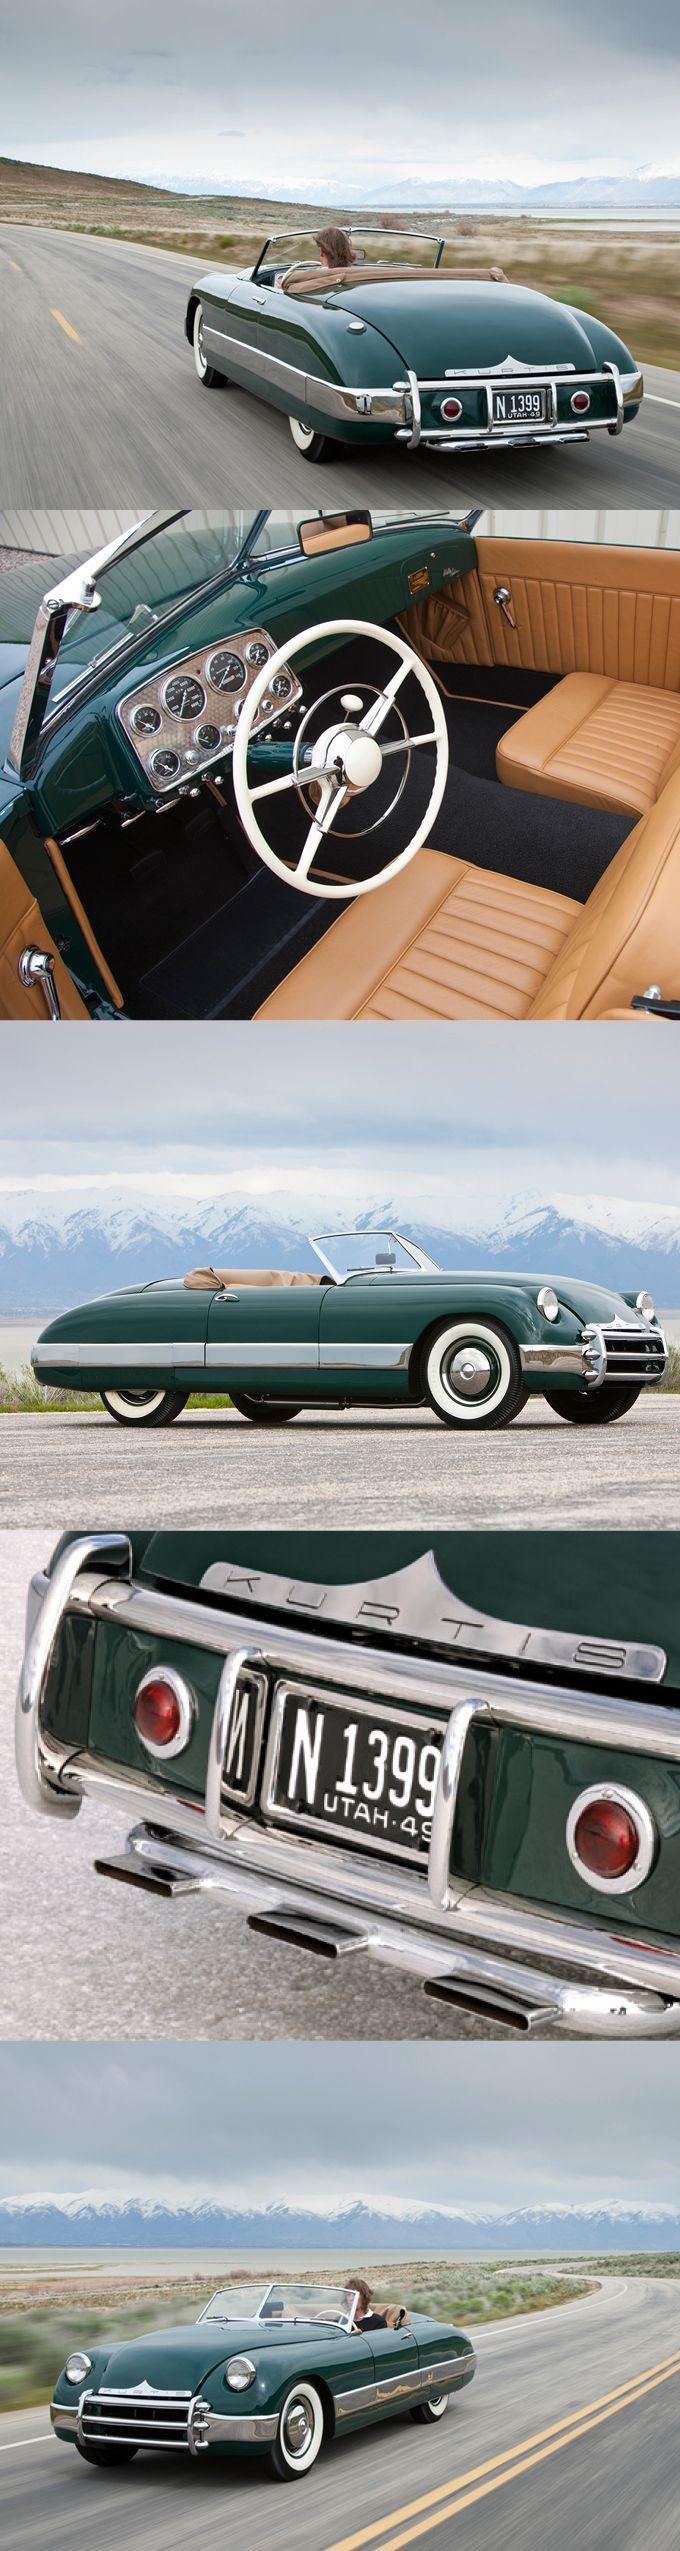 1949 Kurtis Sport / 100hp Ford V8 / 36 produced / USA / green / 17-376